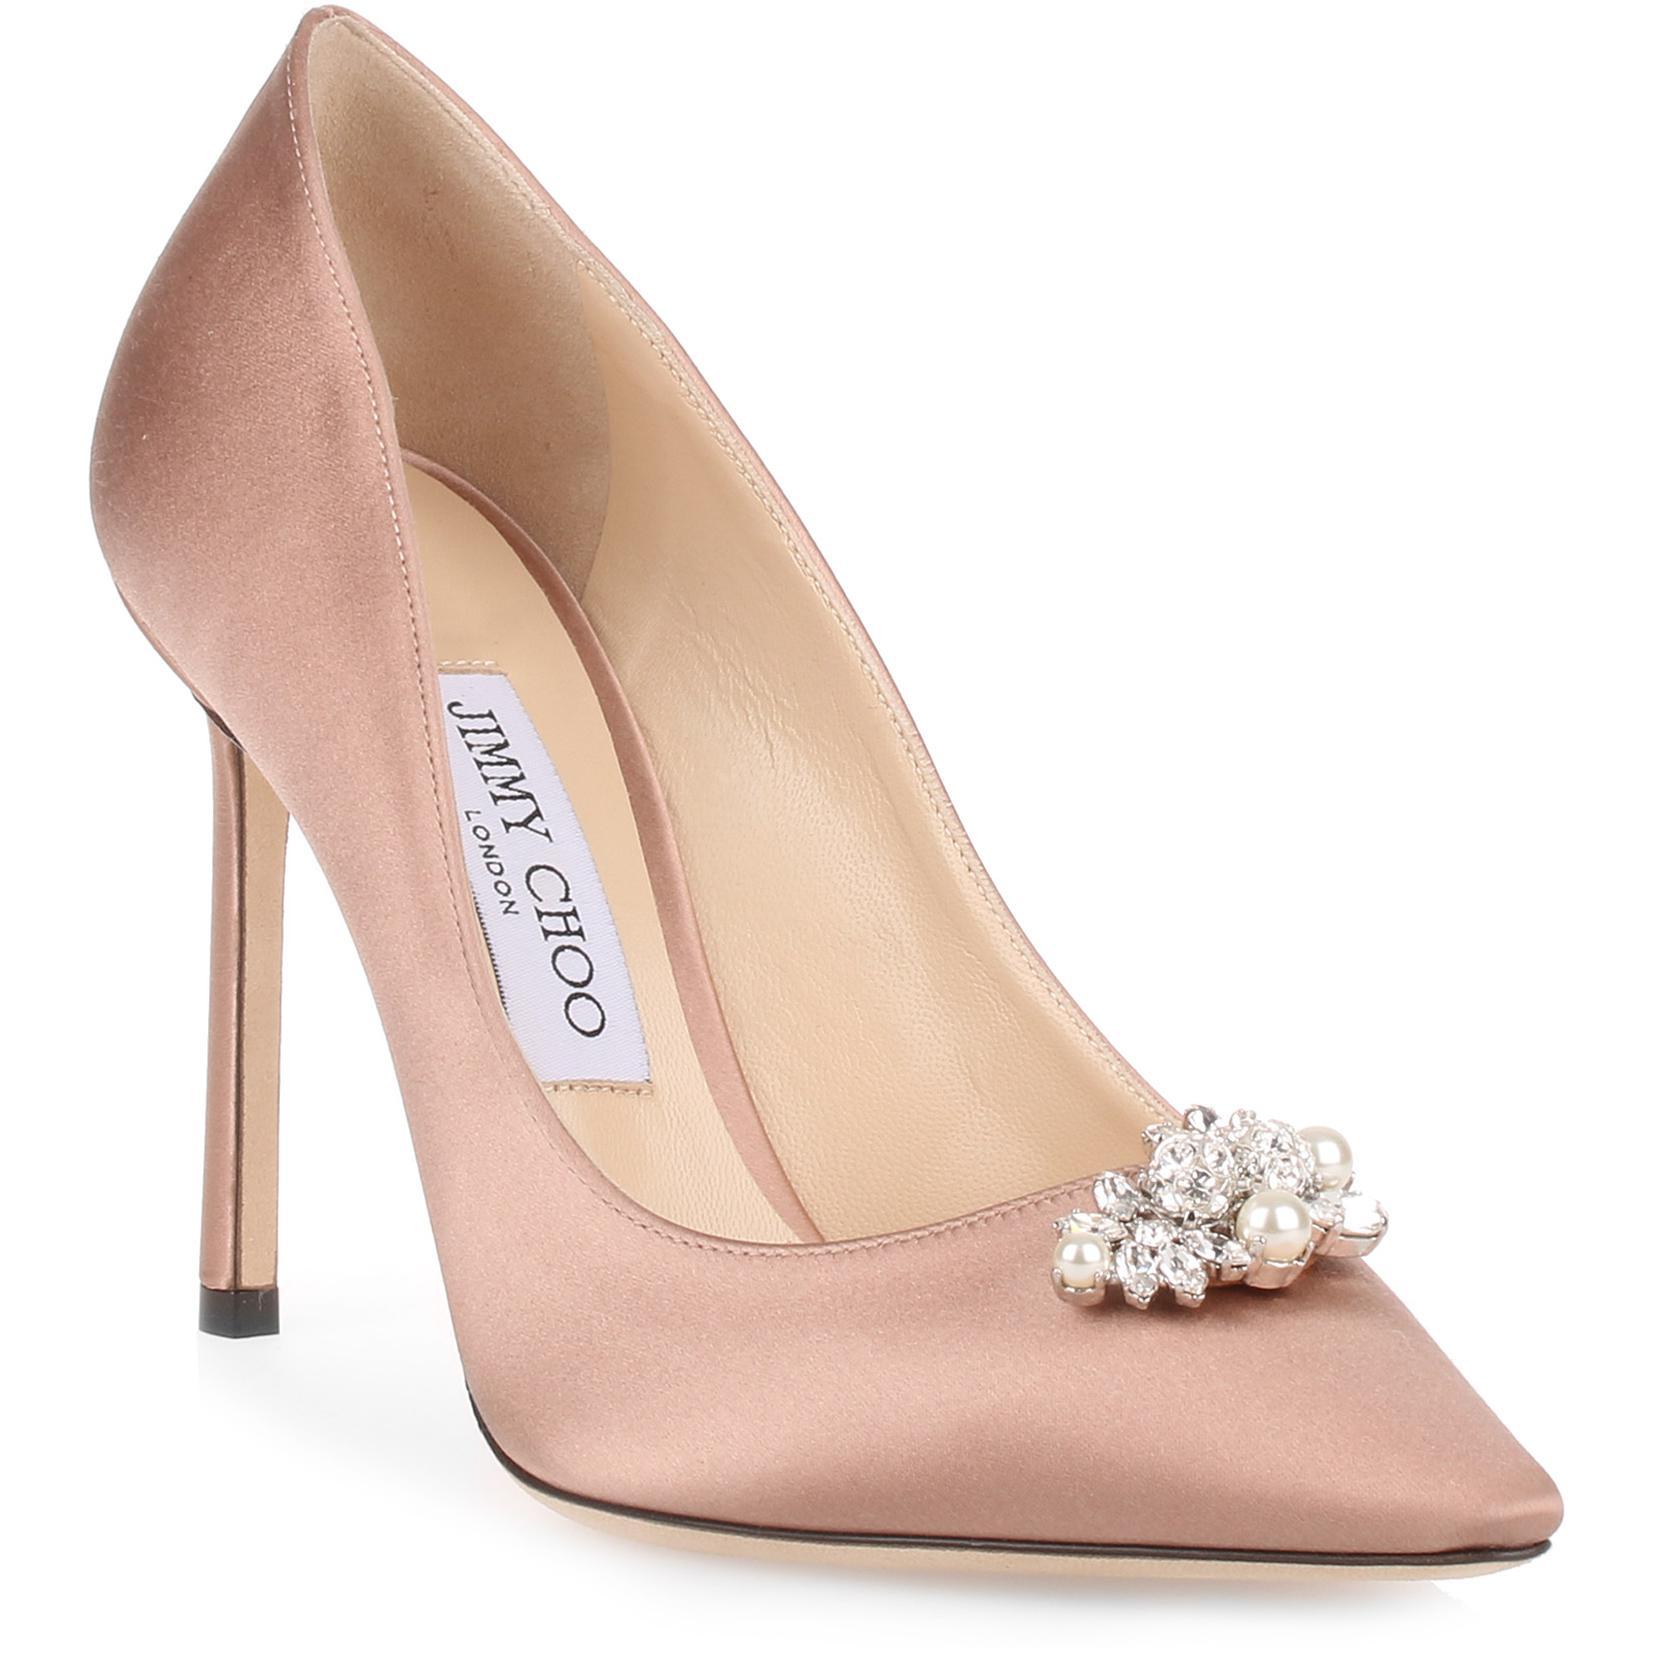 Alexa 100 ballet pink satin crystal pump Jimmy Choo London qbQRW